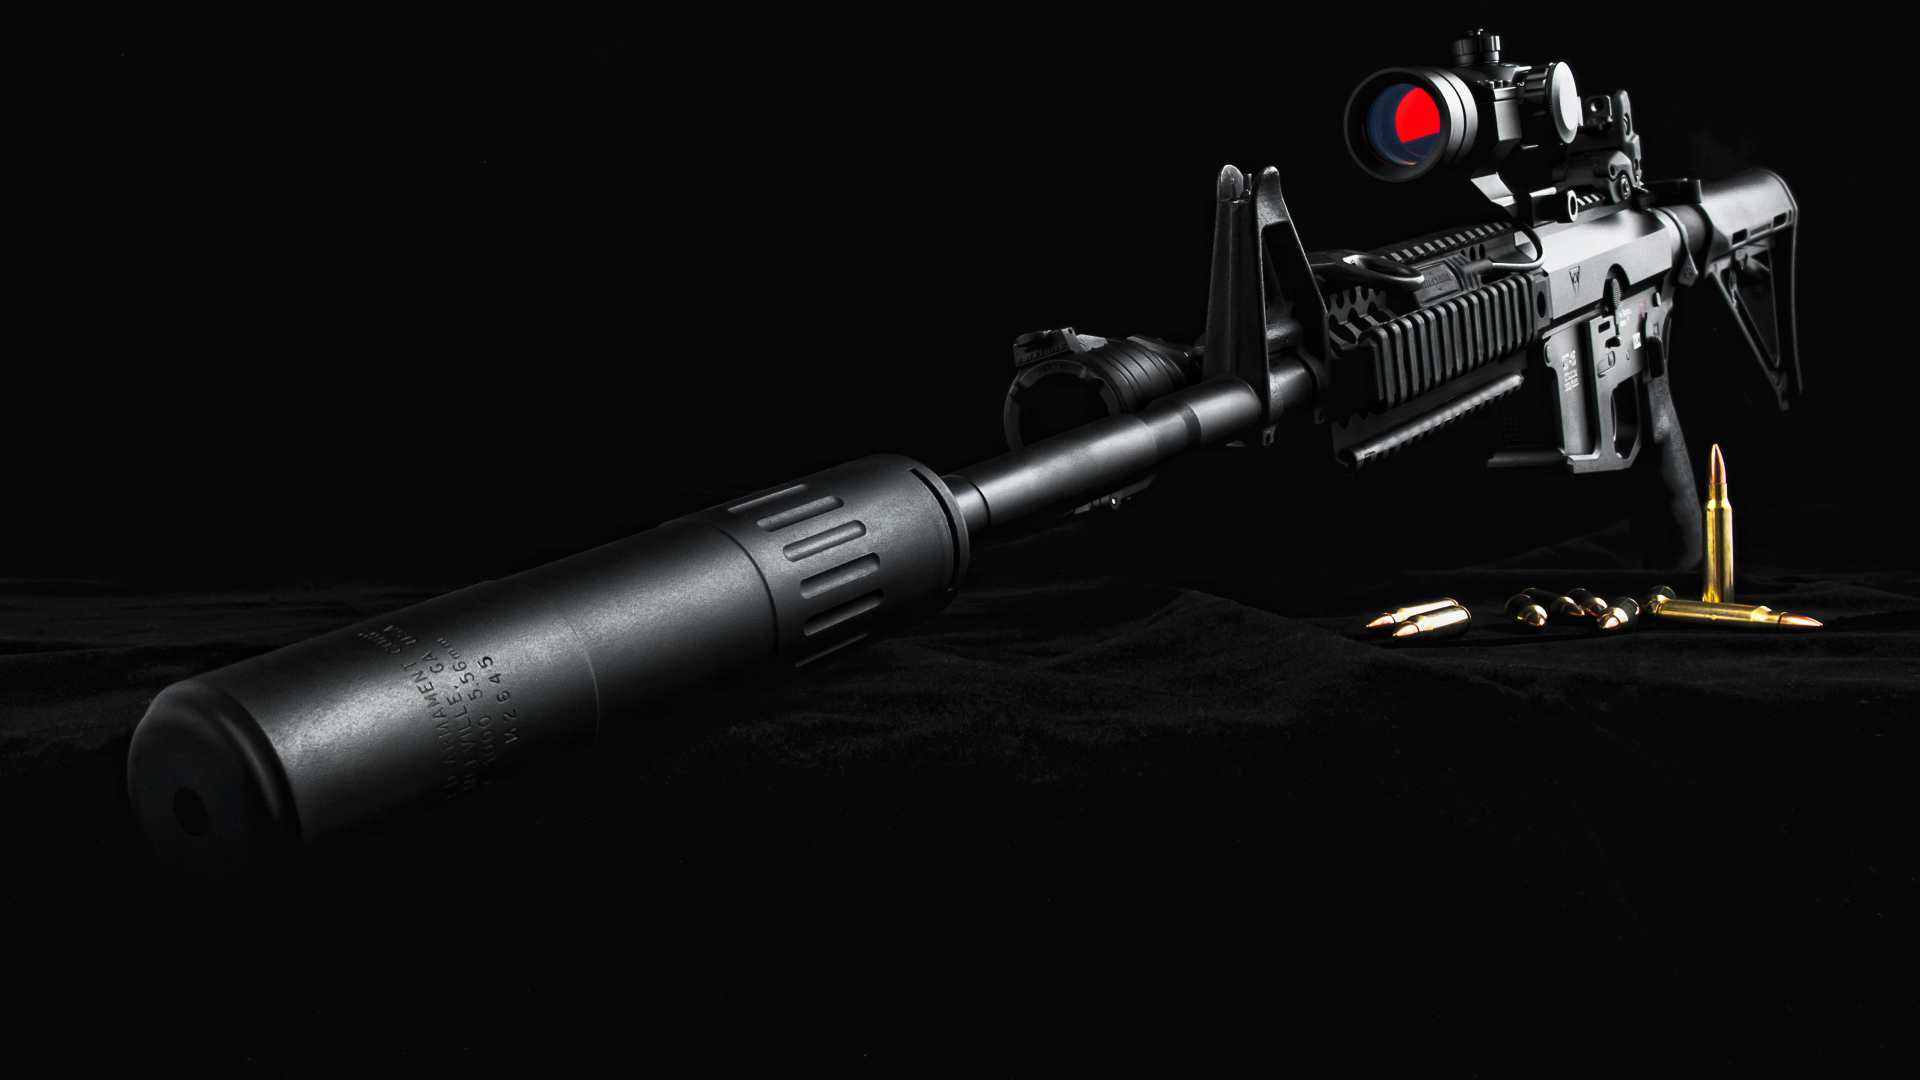 sniper Wallpaper Background 31468 1920x1080